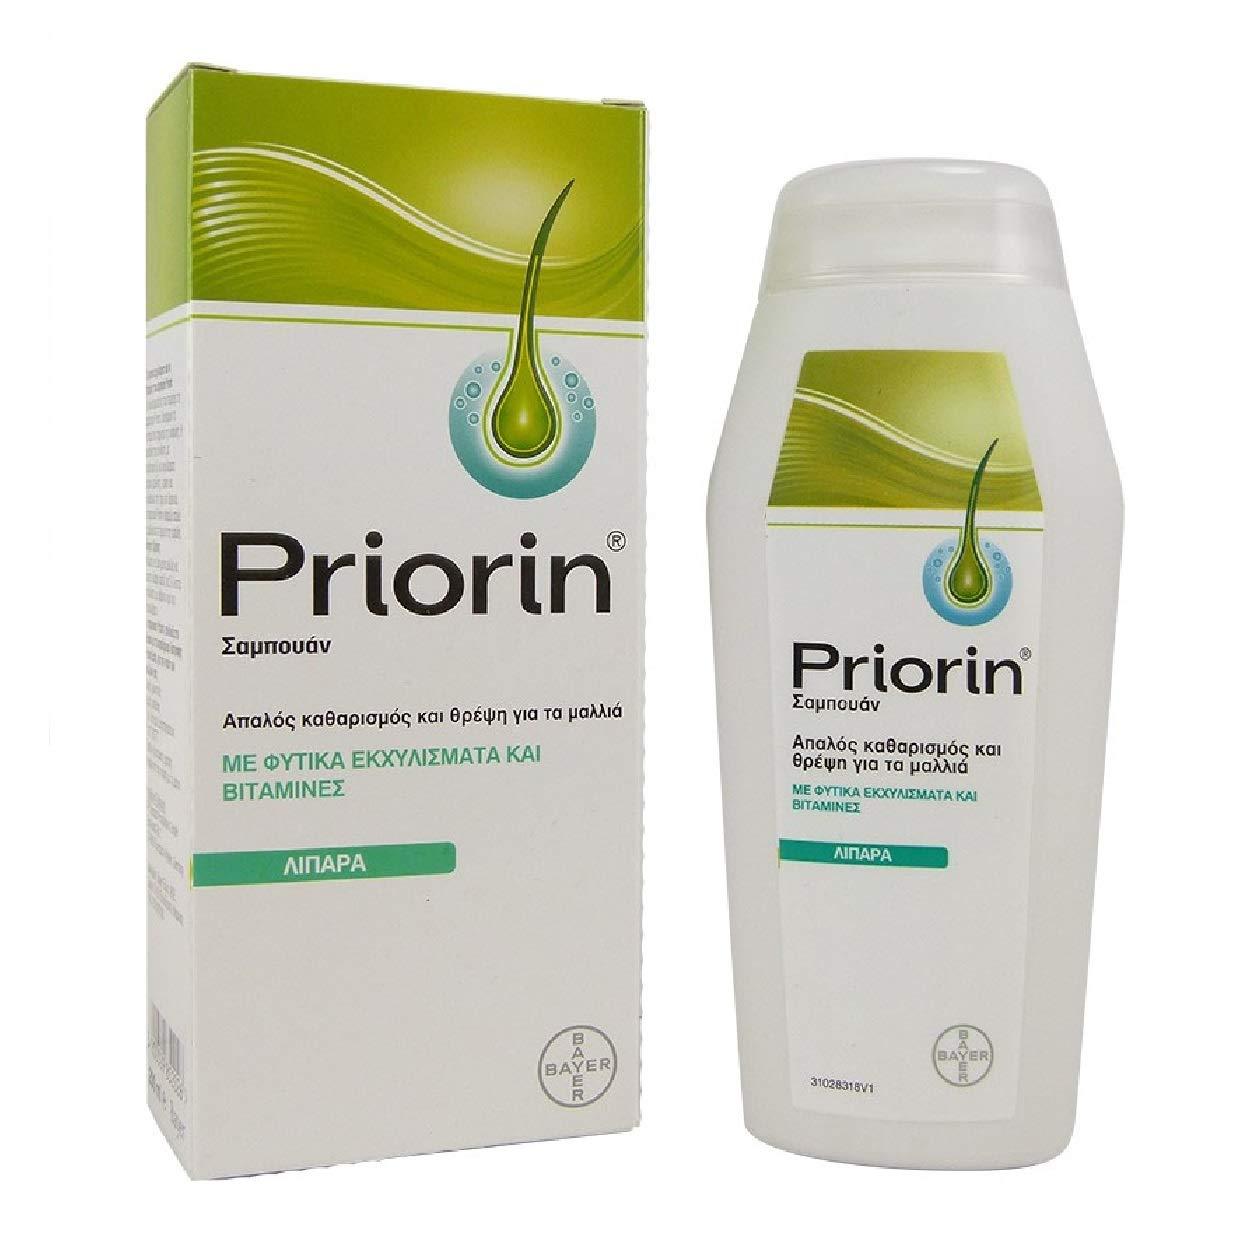 Priorin Anti Hair Loss Shampoo for Normal/dry Hair 200ml Fast Shipping